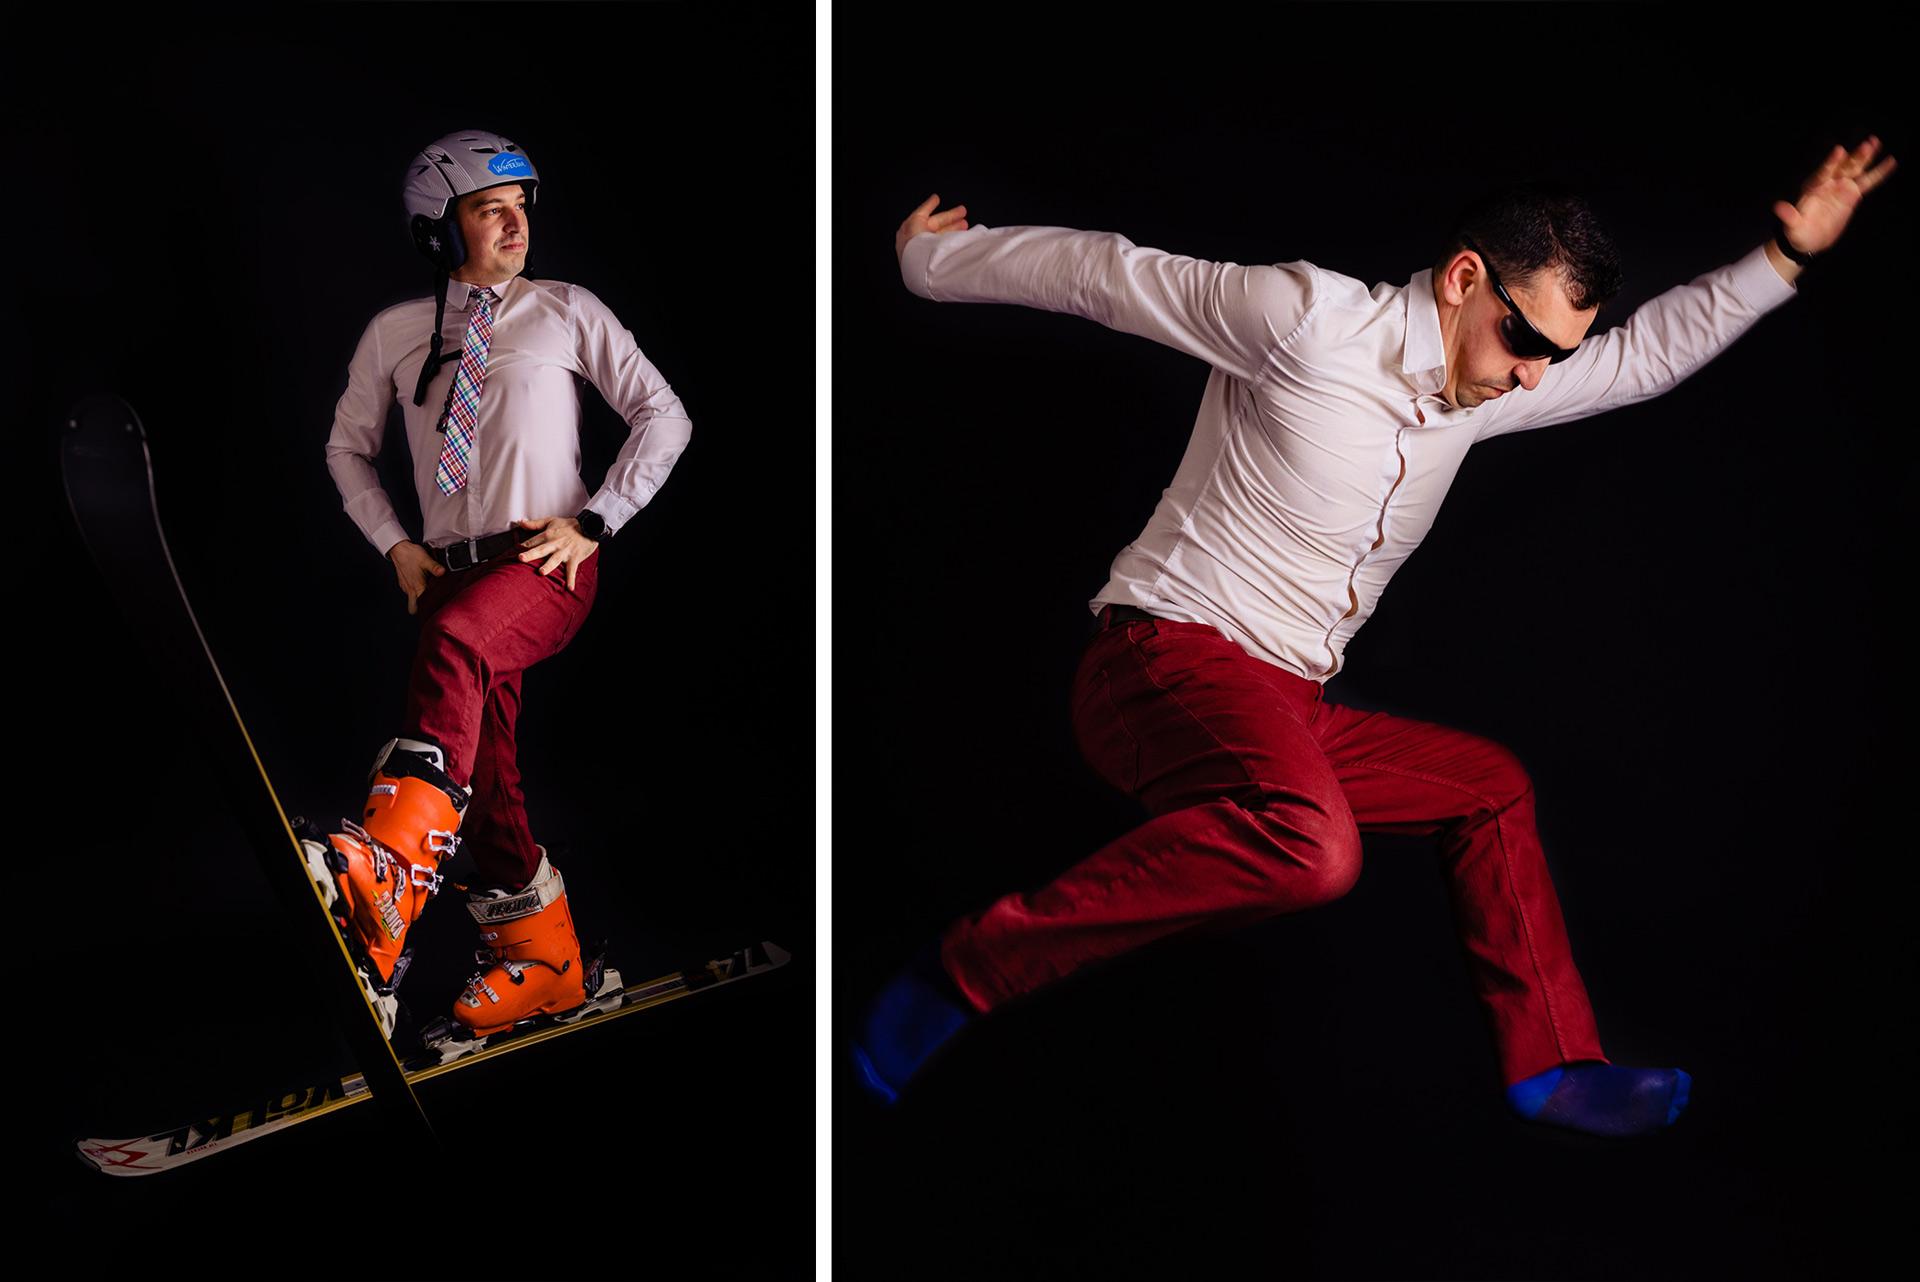 ln ski jump - Ce fac fotografii de nunta in extrasezon